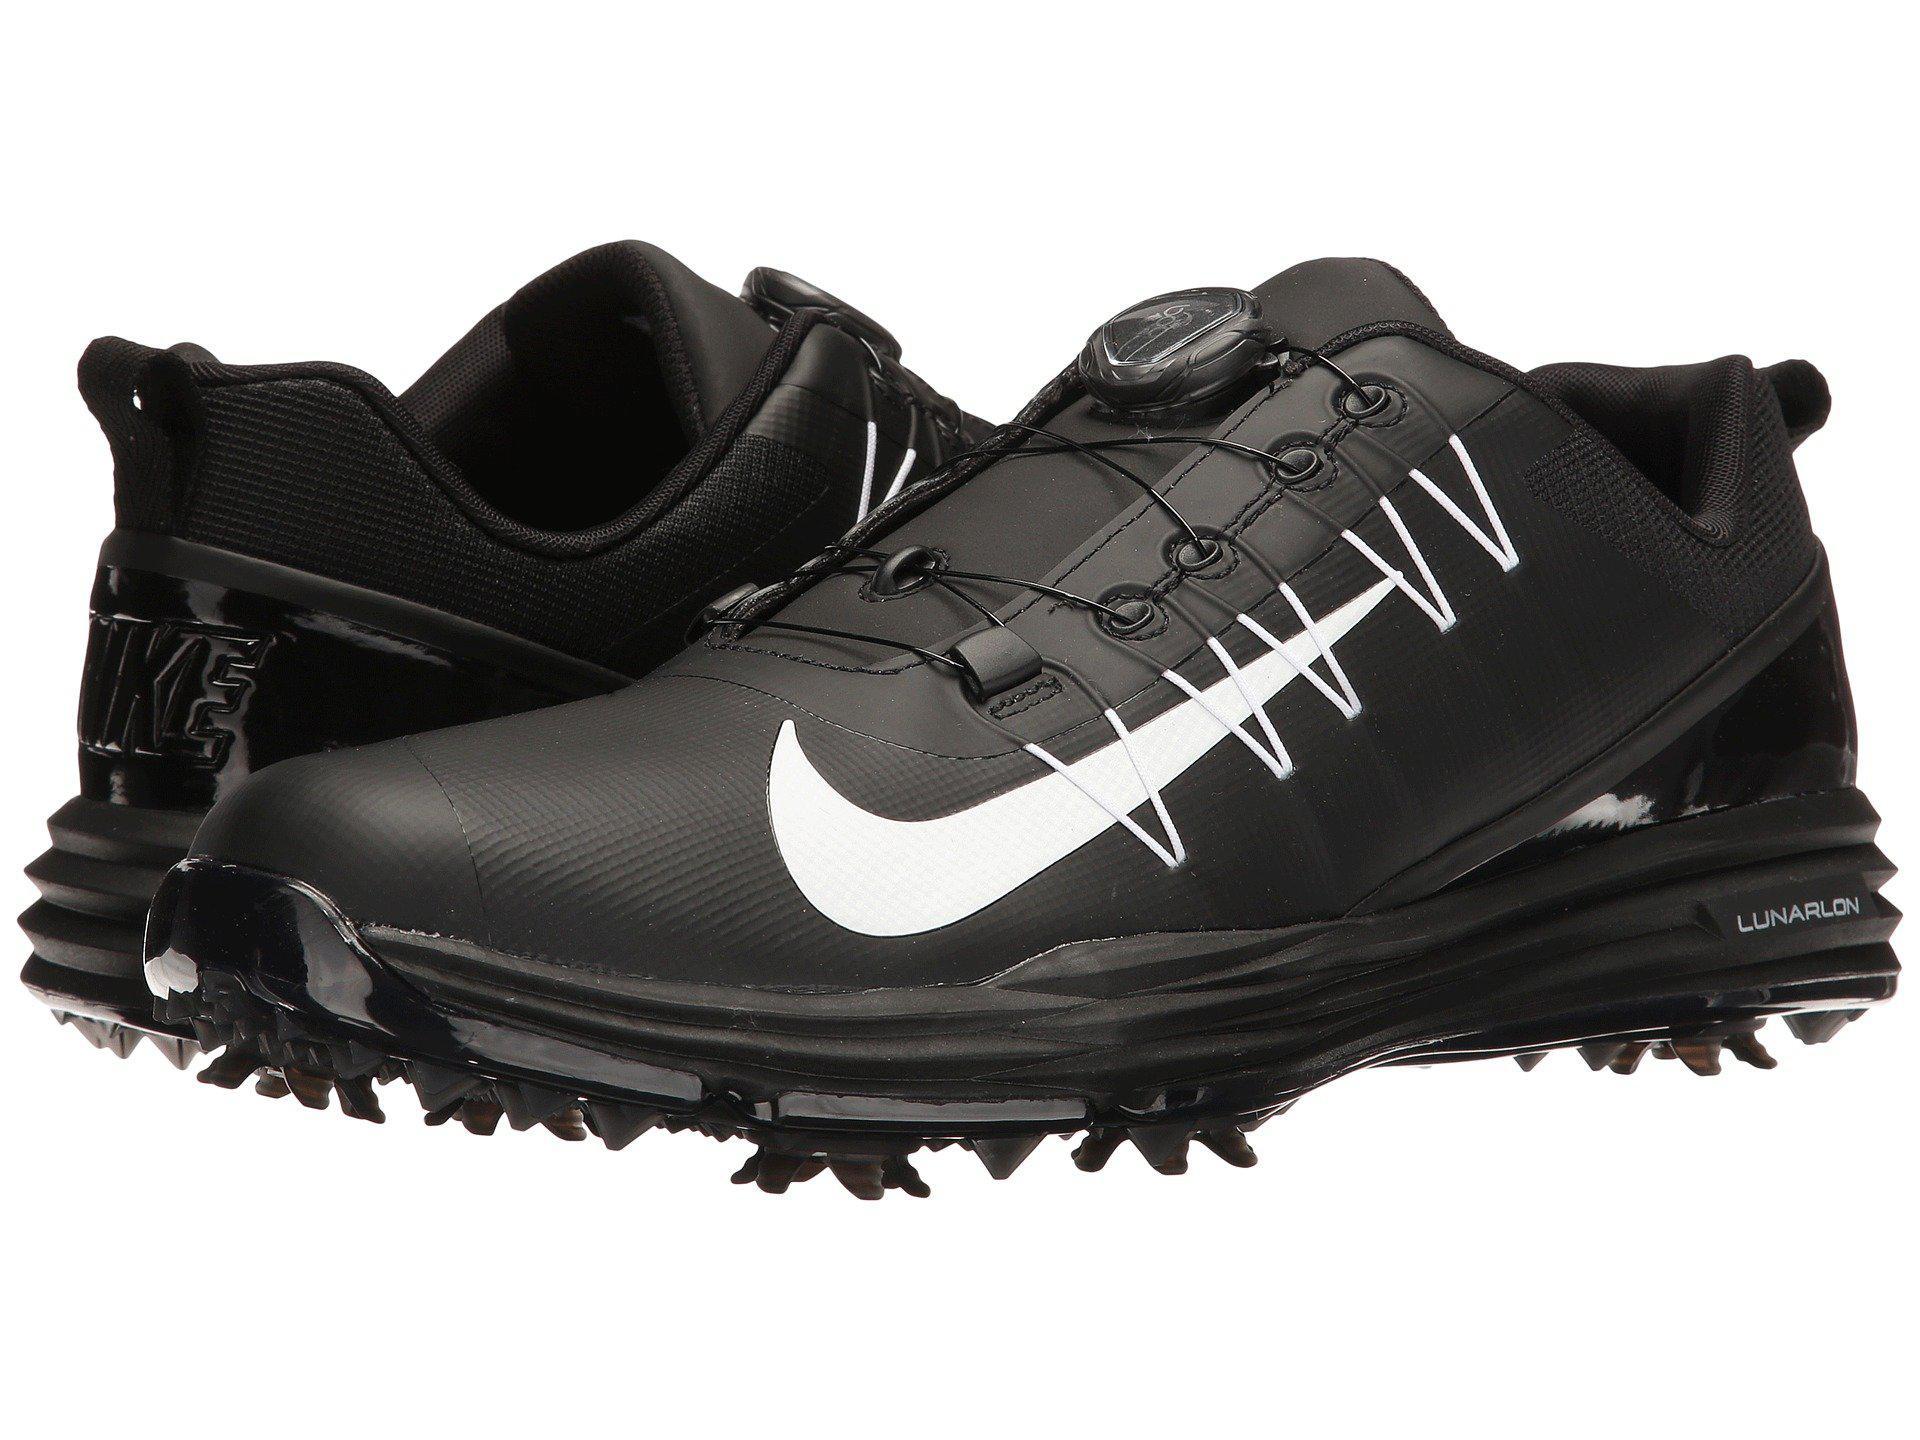 e45ee456d1ad Lyst - Nike Lunar Command 2 Boa (black white black) Men s Golf Shoes ...